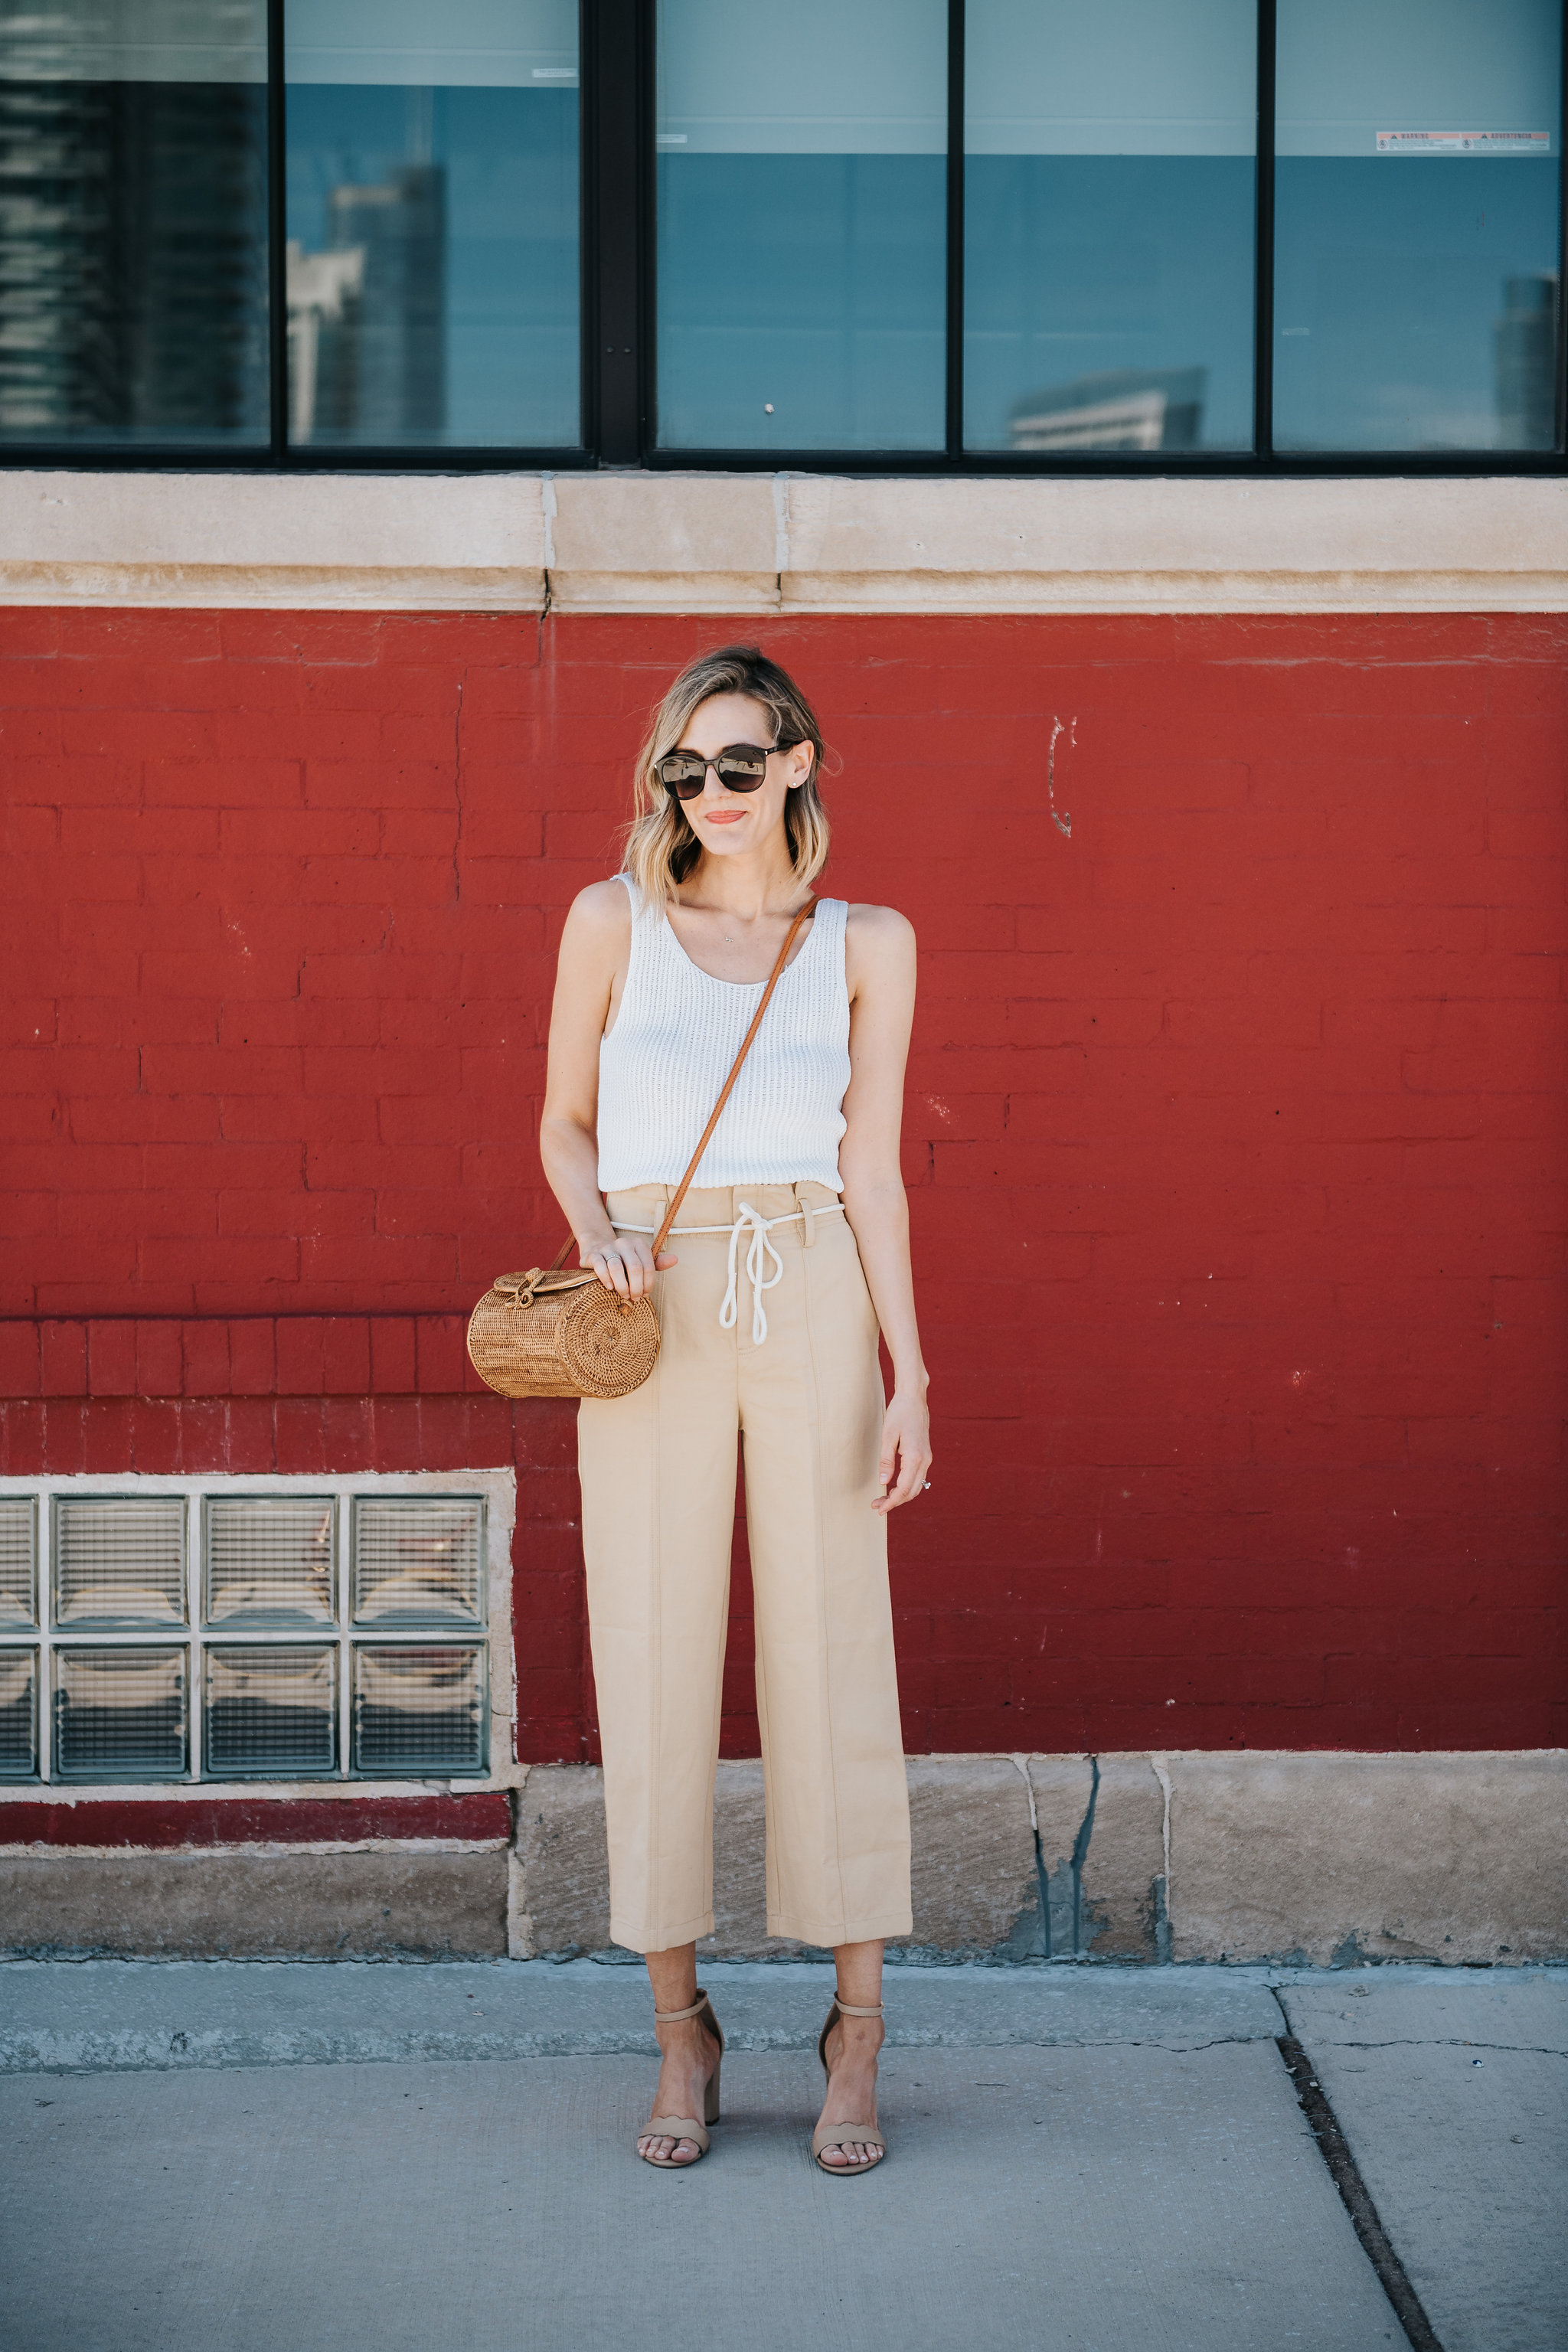 vince tank pants classic summer outfit linen